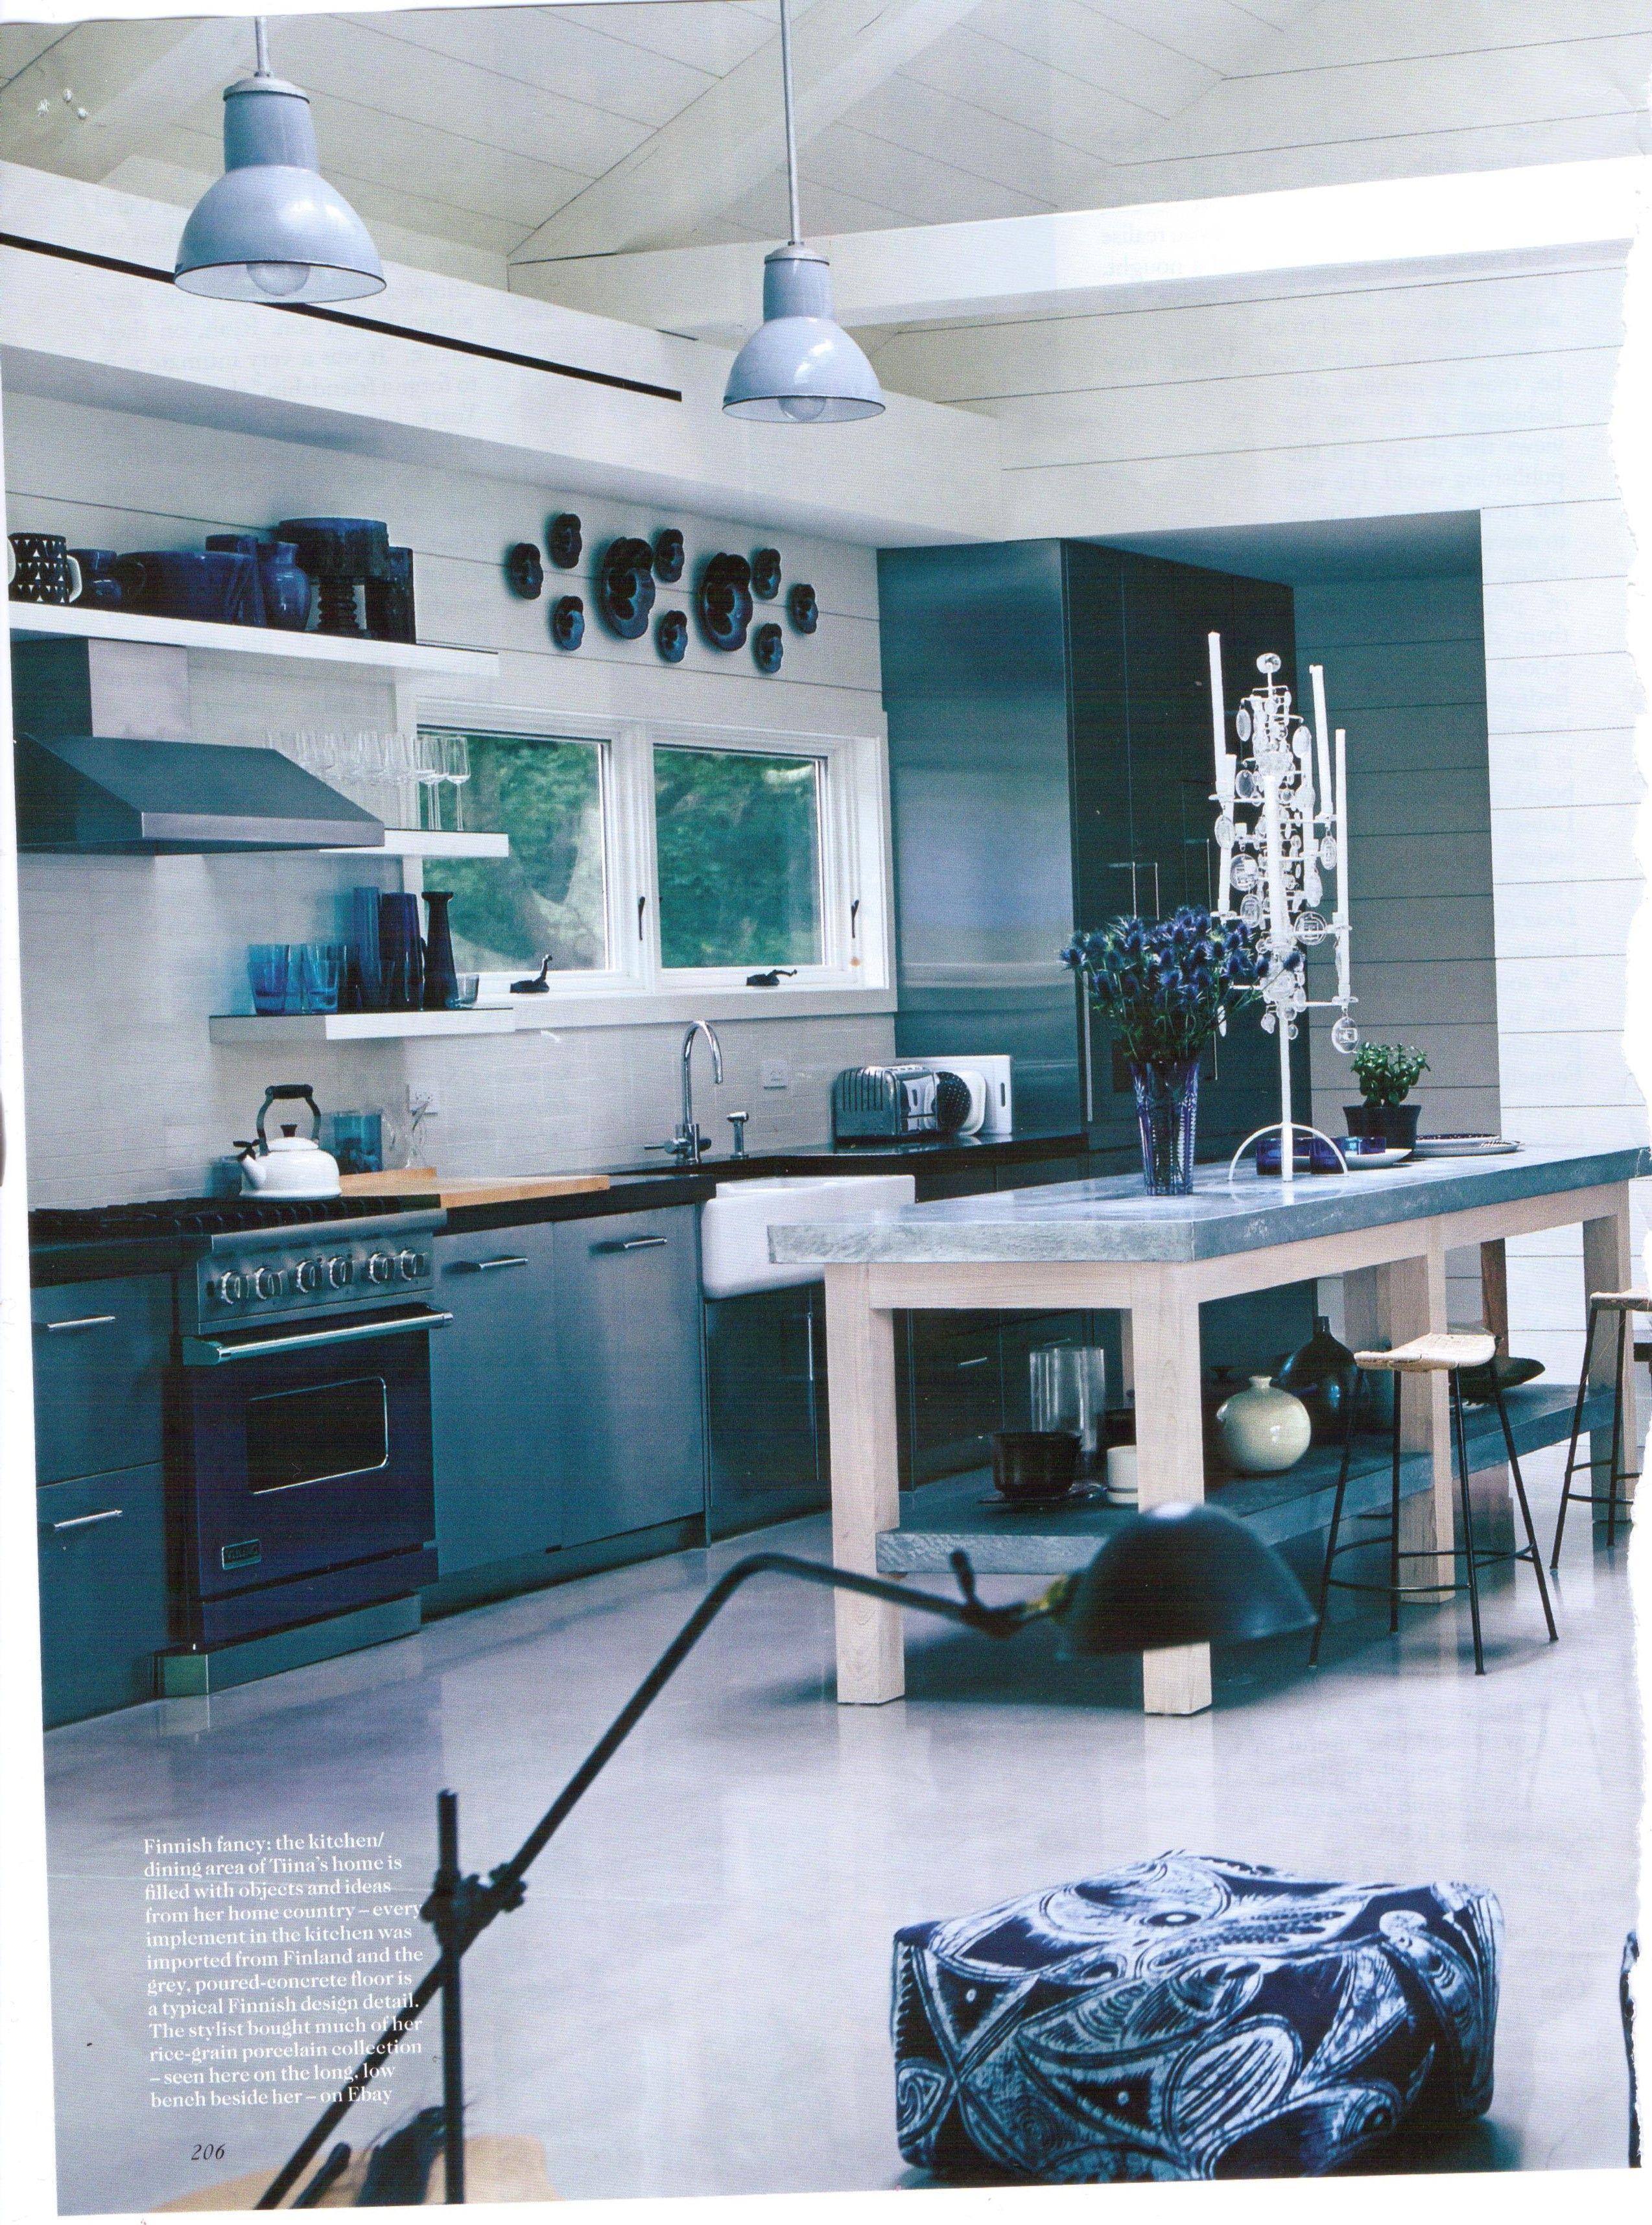 Perfect Kitchen from Tiina Laakkonen\'s Long Island Home - Vogue UK ...